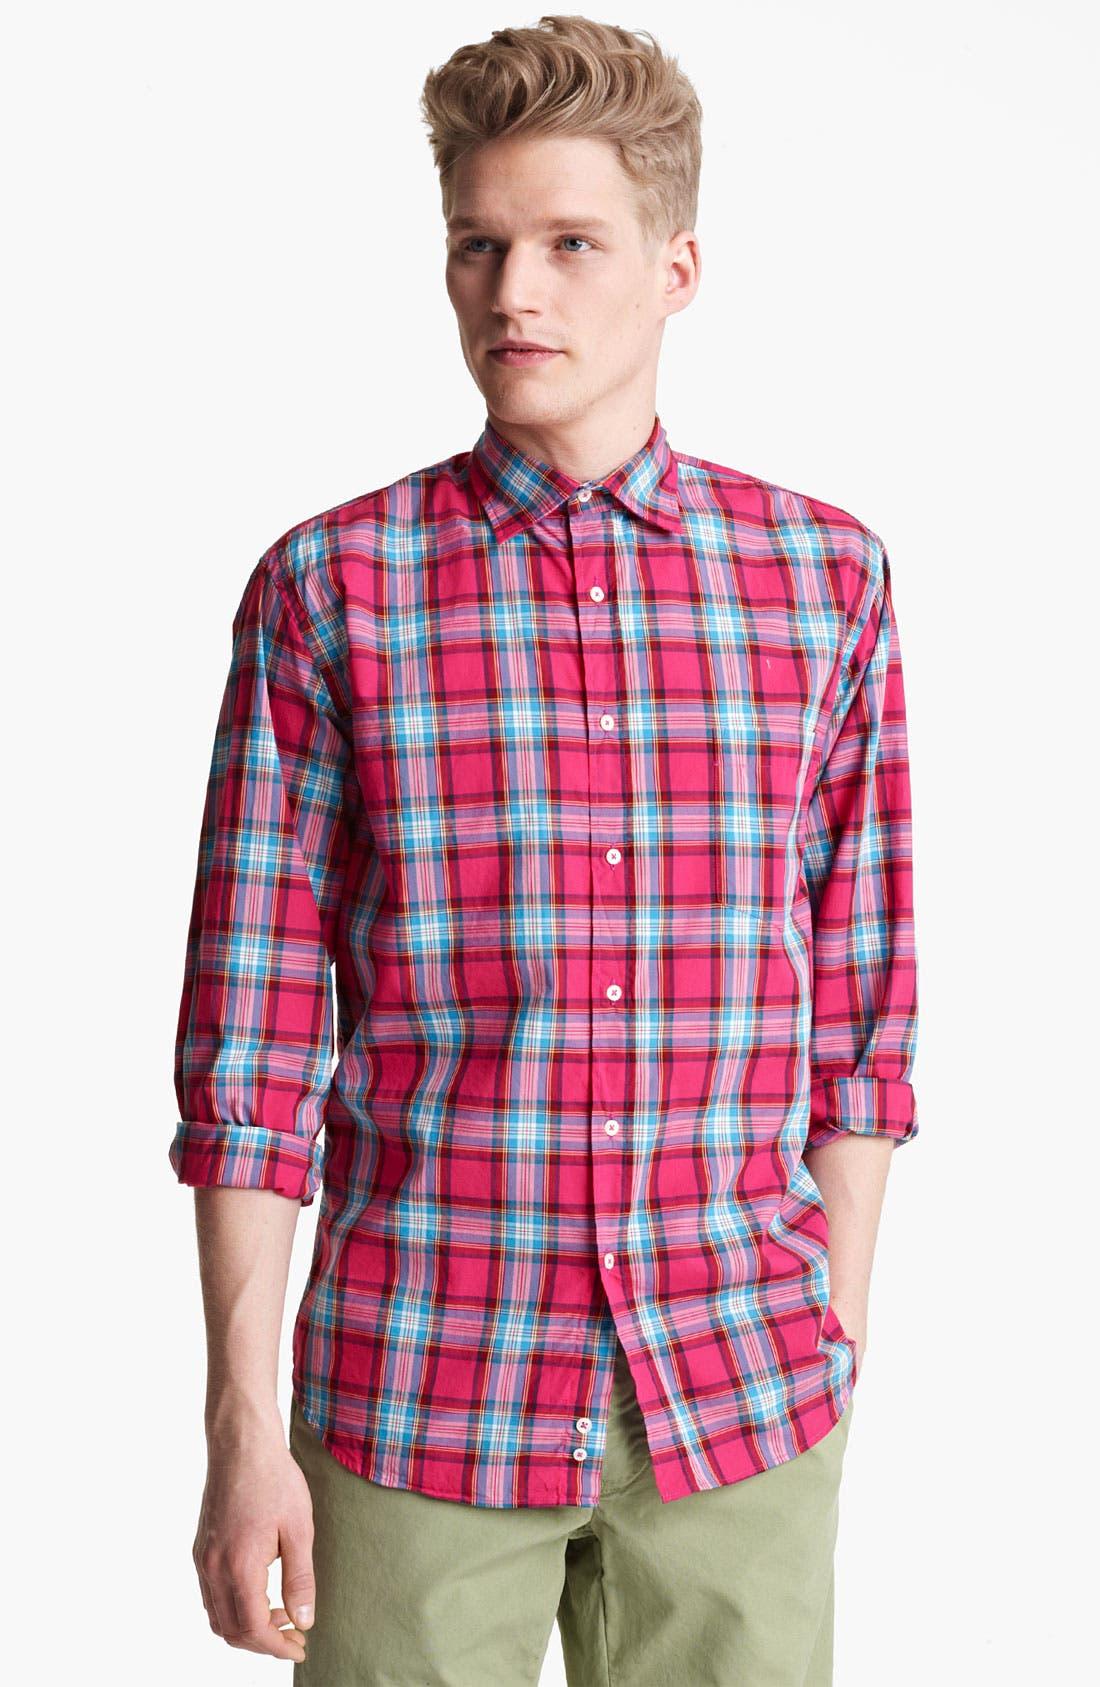 Main Image - Mason's Plaid Woven Shirt